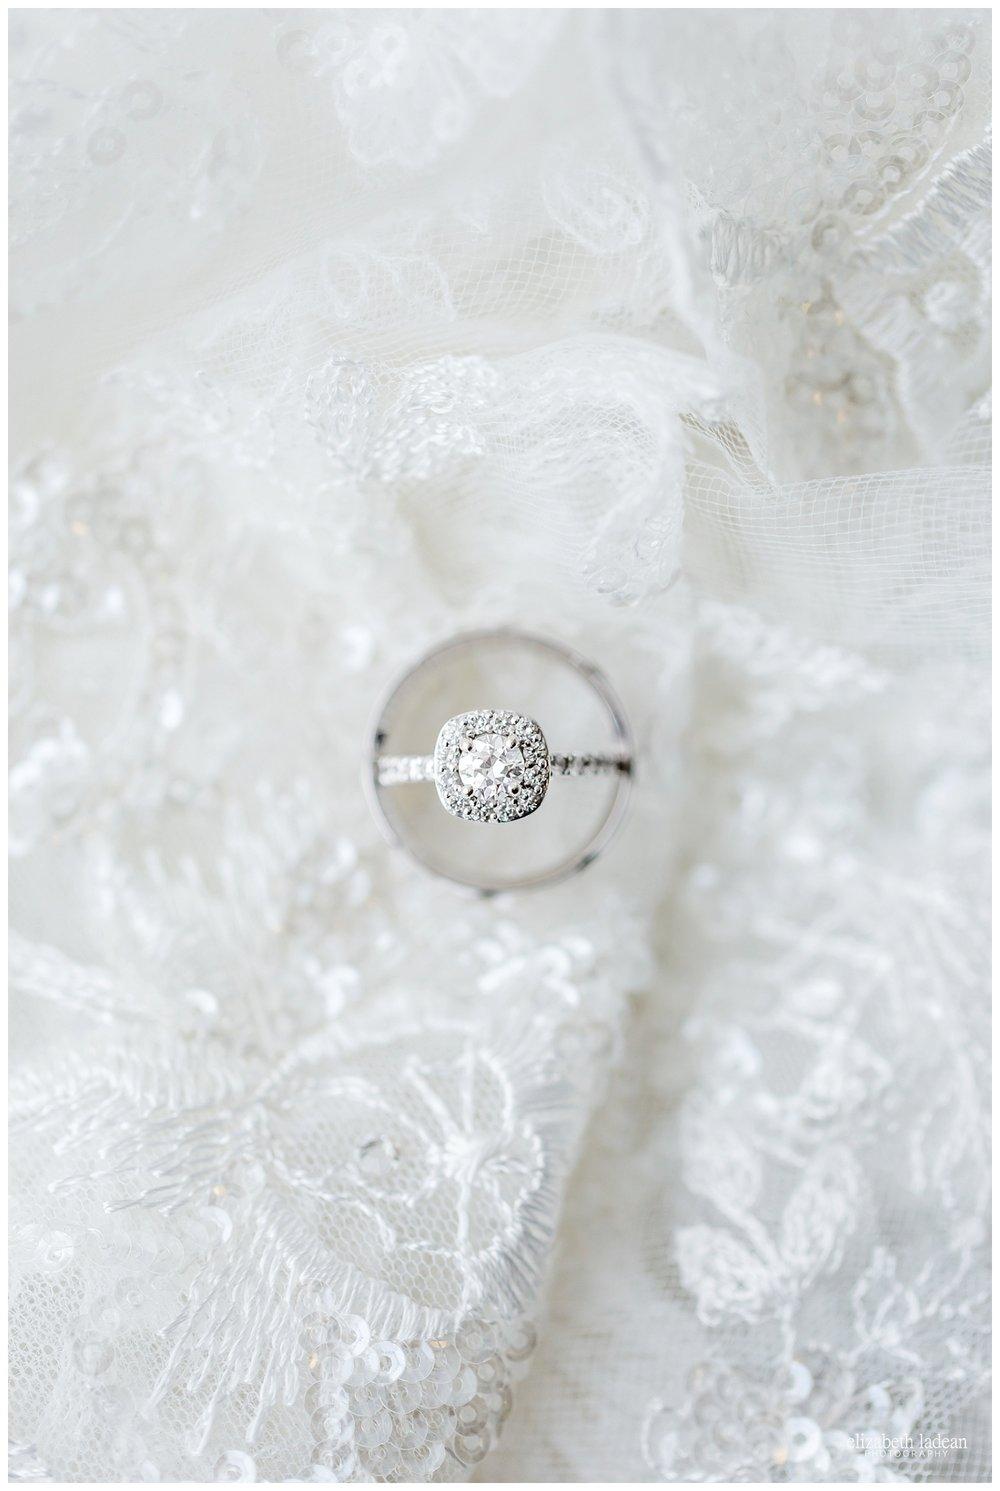 Amigoni-Winery-Wedding-Photos-R+J2017-Kansas-City-Elizabeth-Ladean-Photography-photo-_5339.jpg